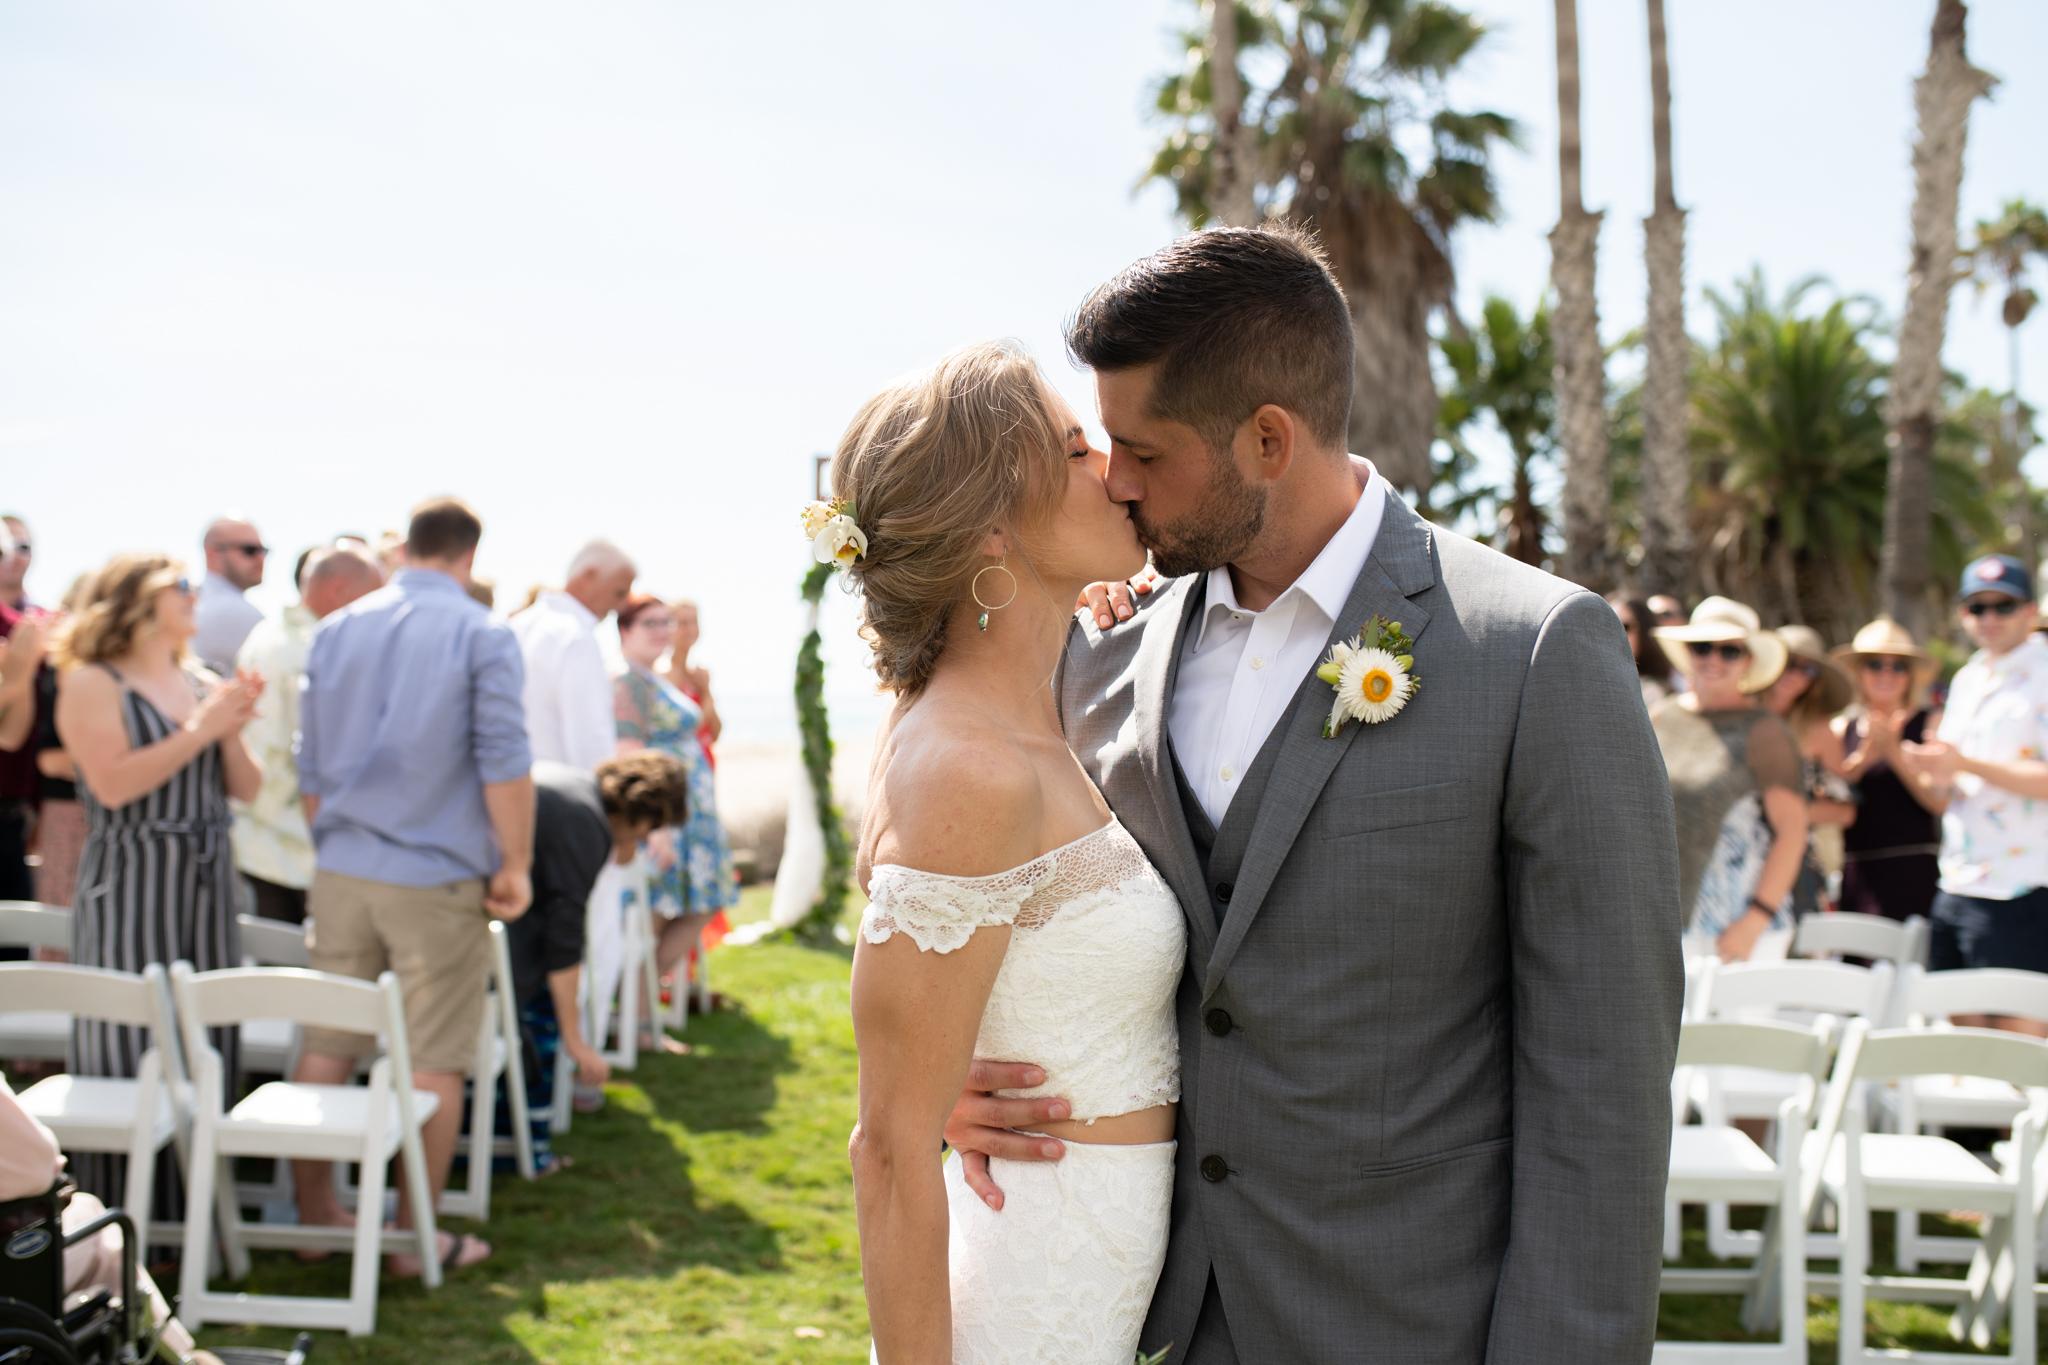 37_PRVW_Jenny_Ken_Wedding_Trevor_Hooper_Photo.jpg